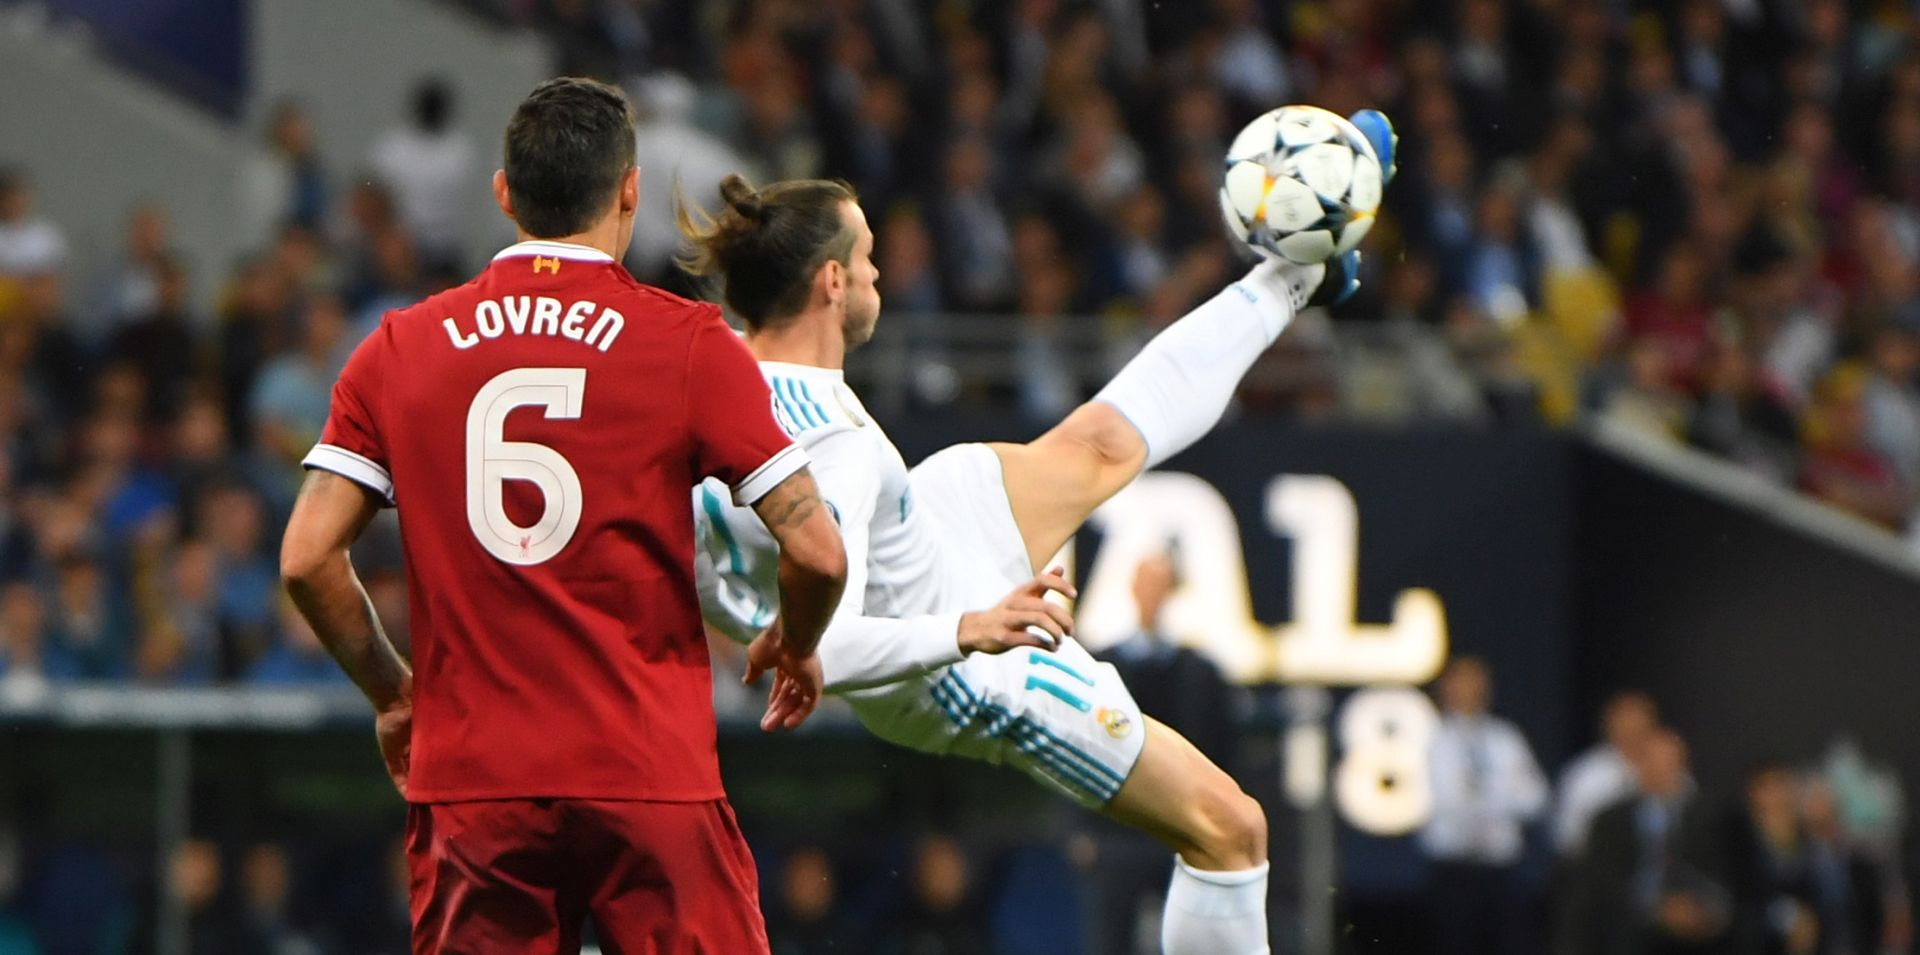 FOTO: OPET NA KROVU EUROPE Bale junak Reala, Karius apsolutni tragičar 'Redsa'